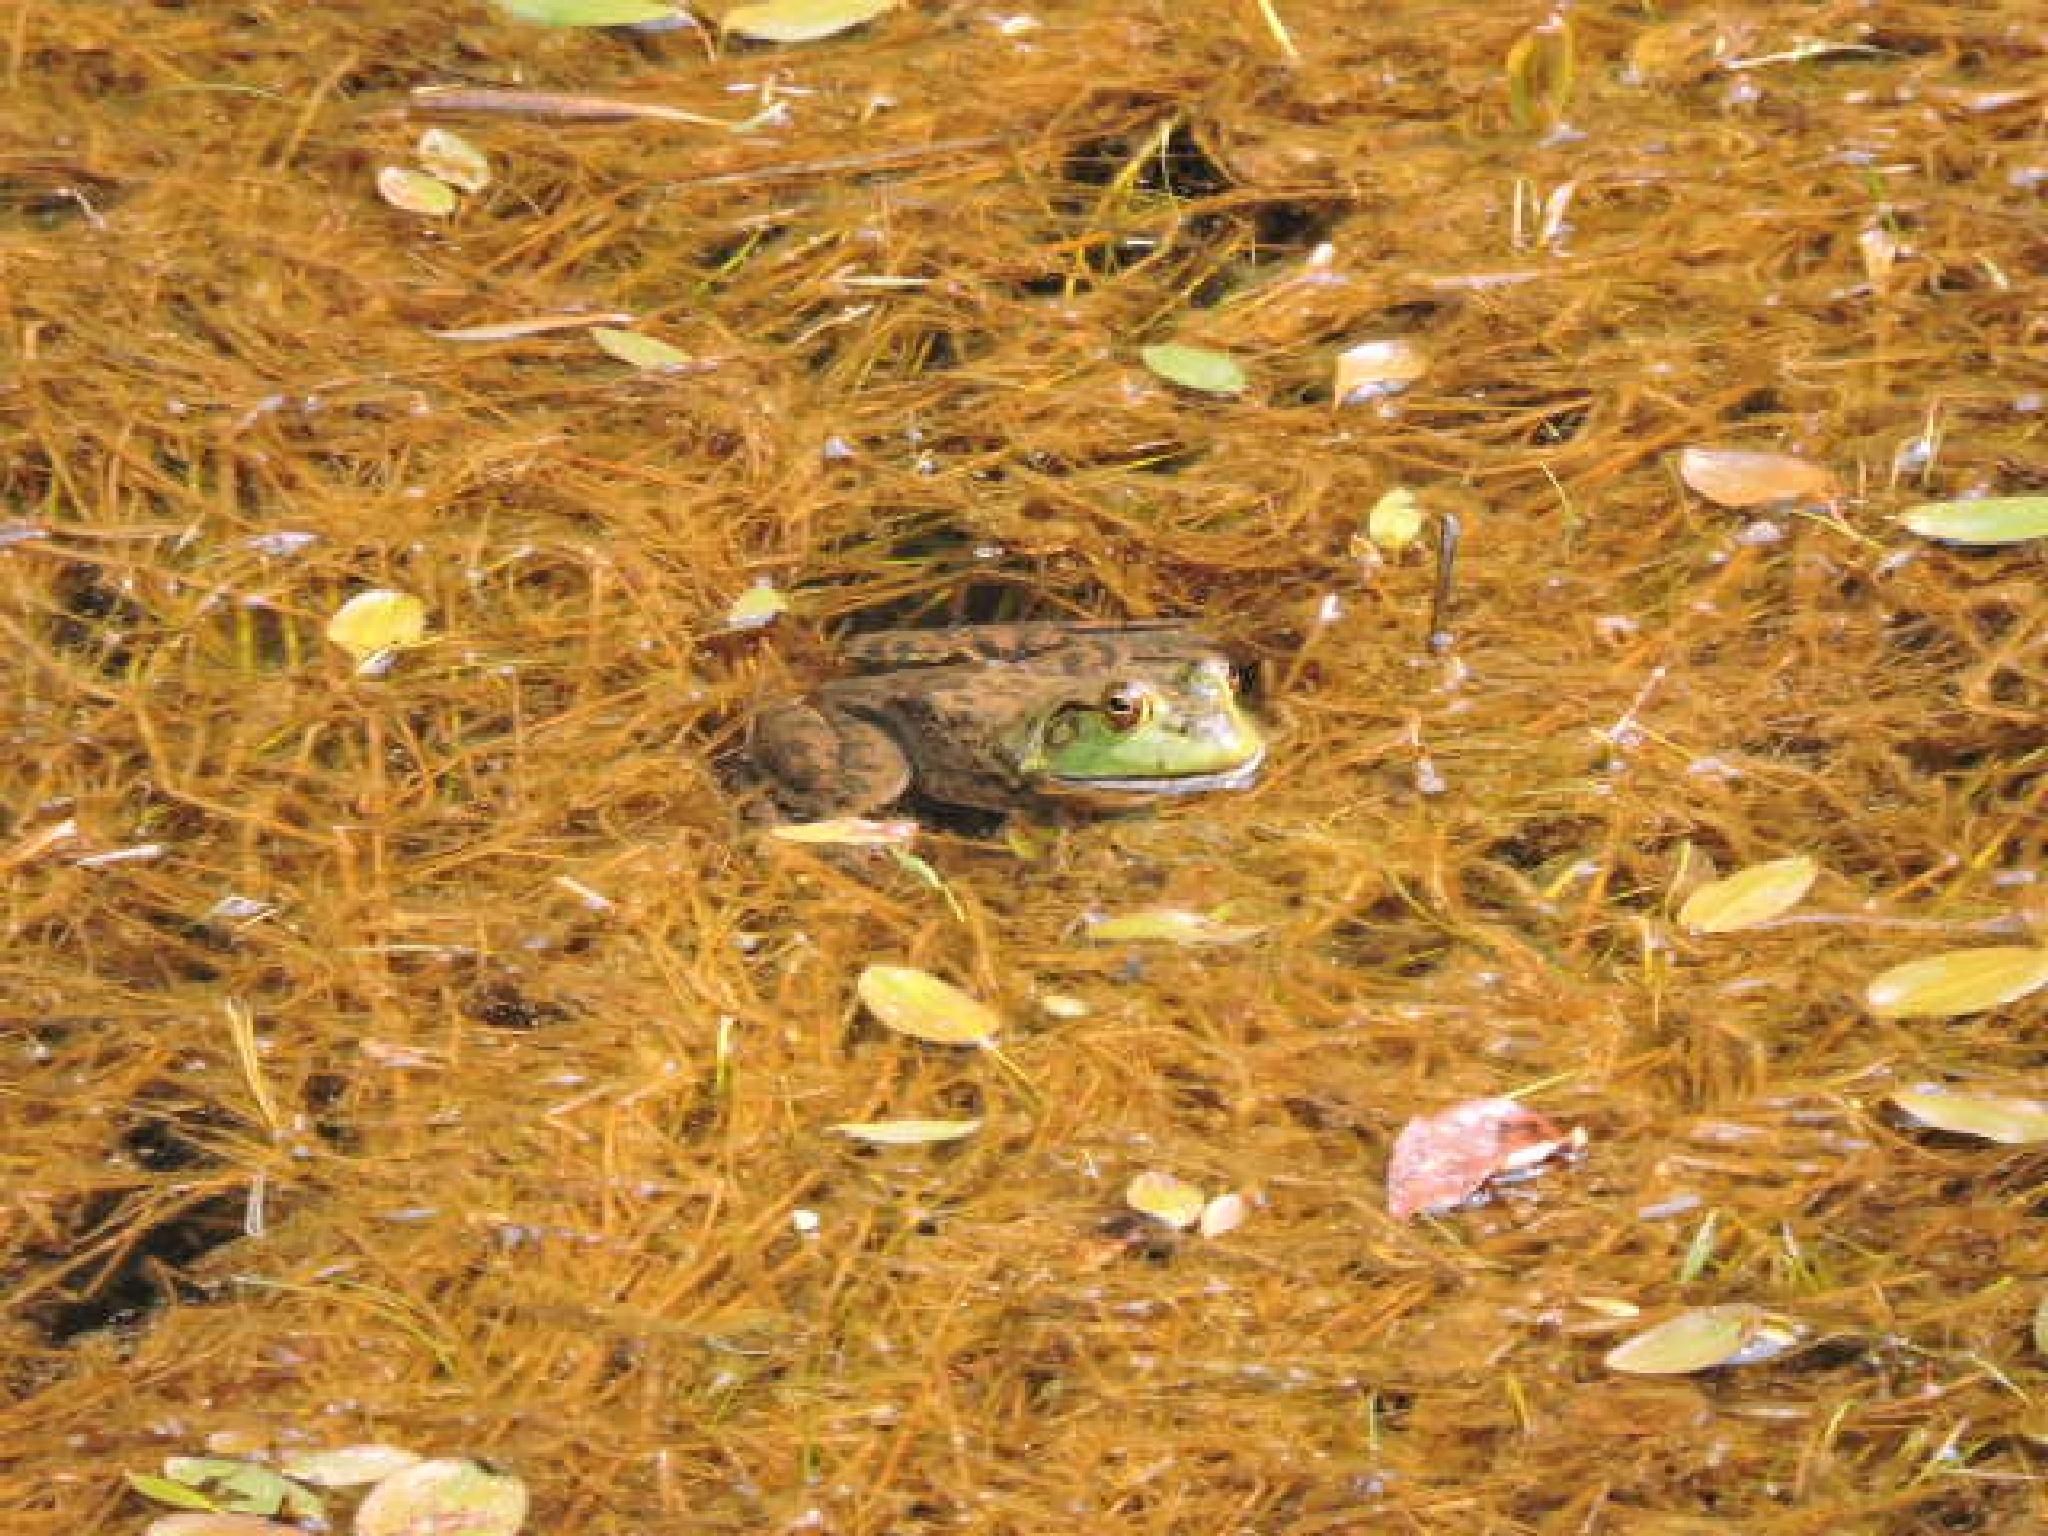 Southern Oregon Bullfrog by KrystaGarrison